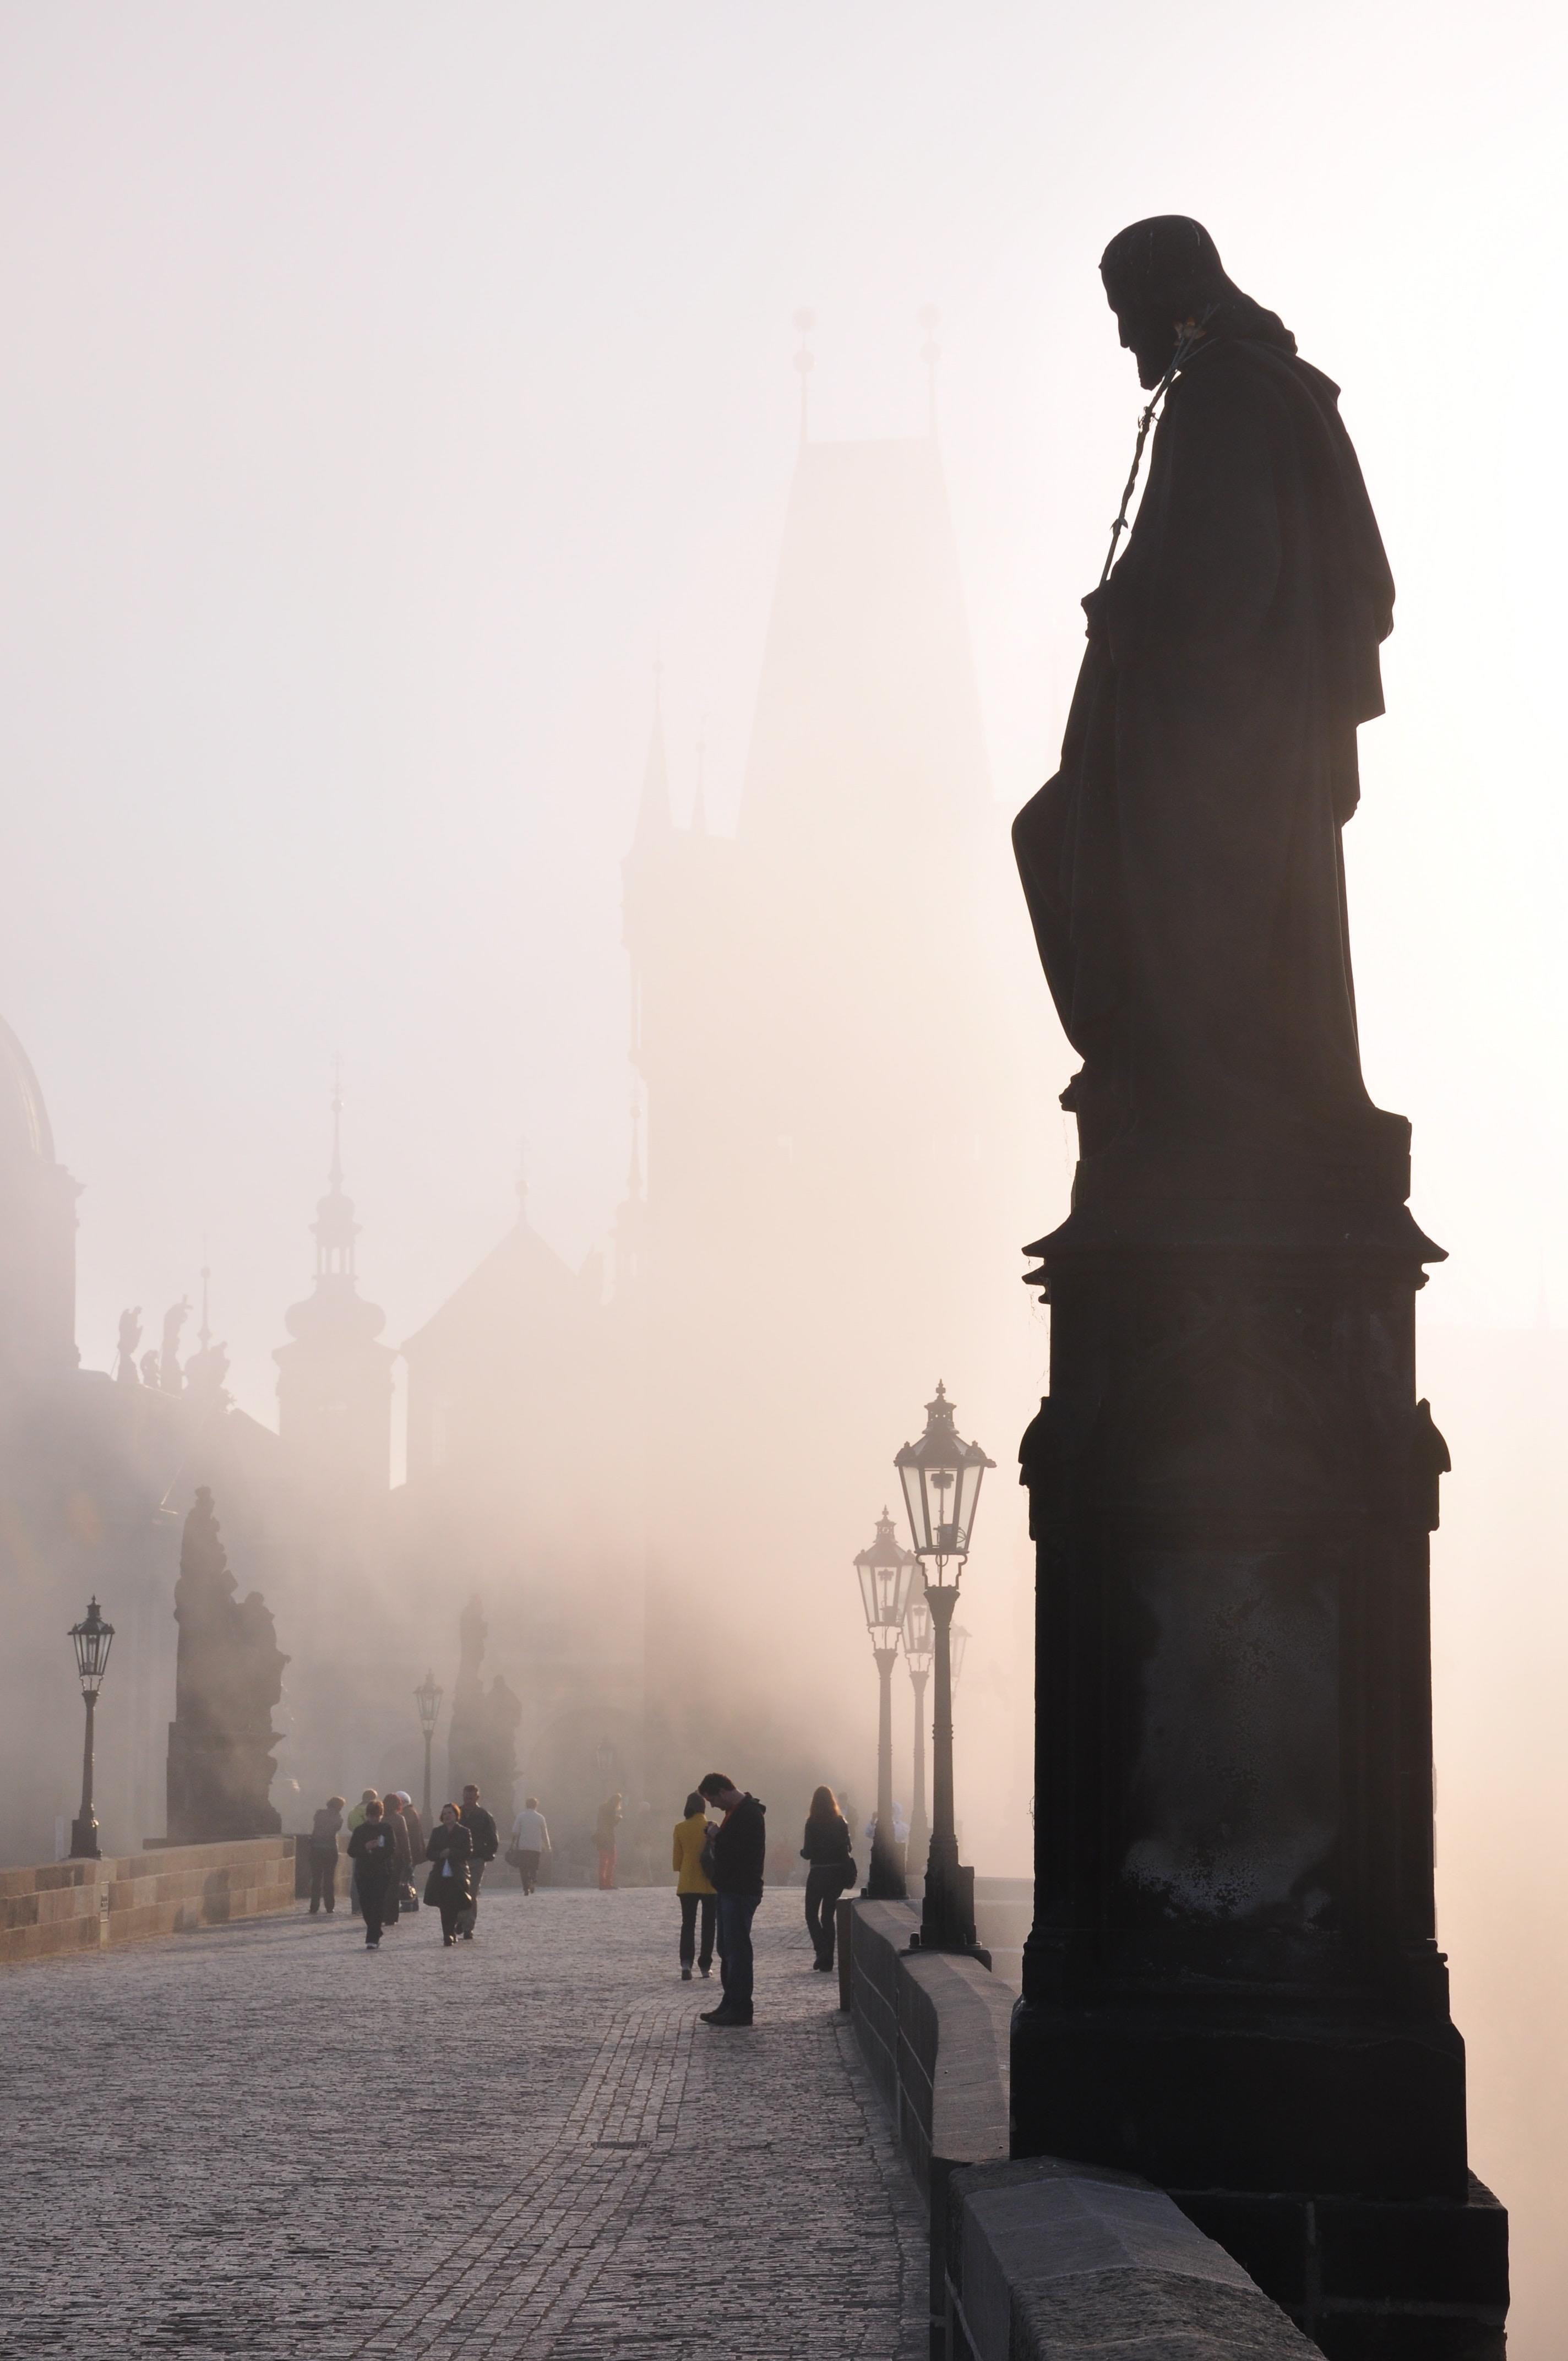 prague-castle-and-mala-strana-district-tour-20